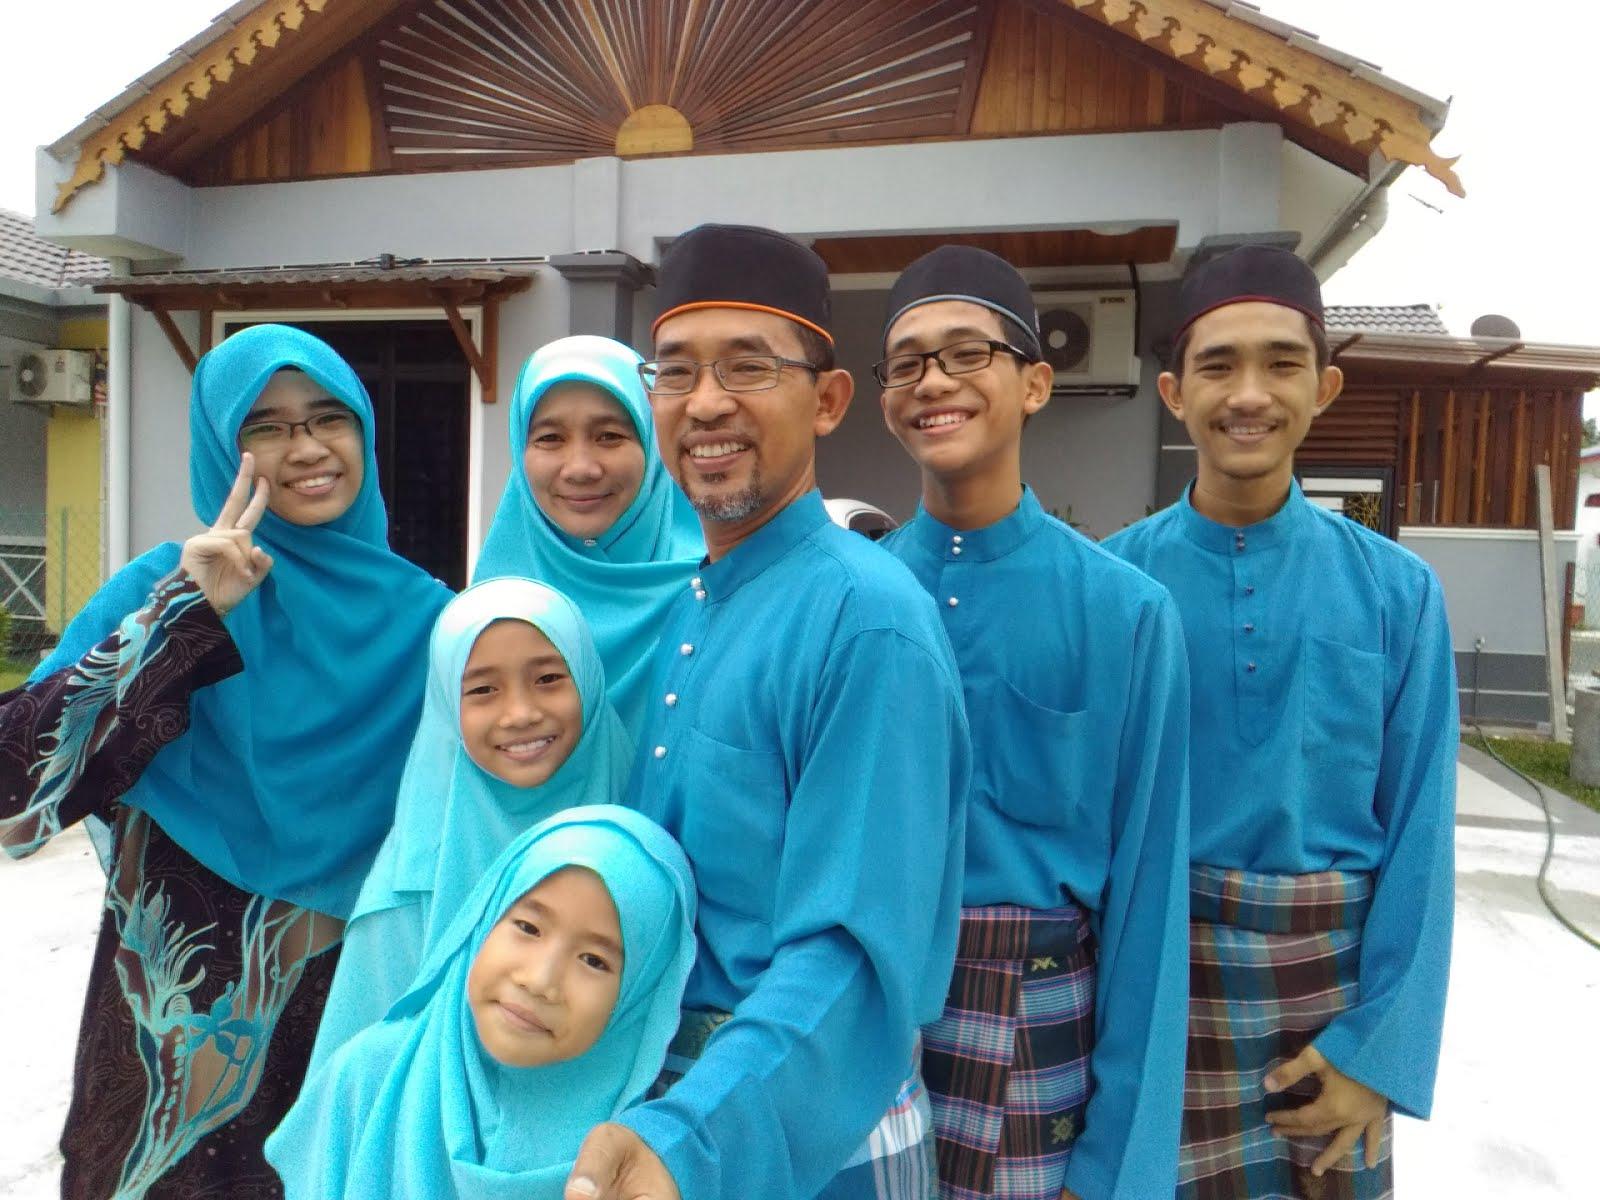 Family KU